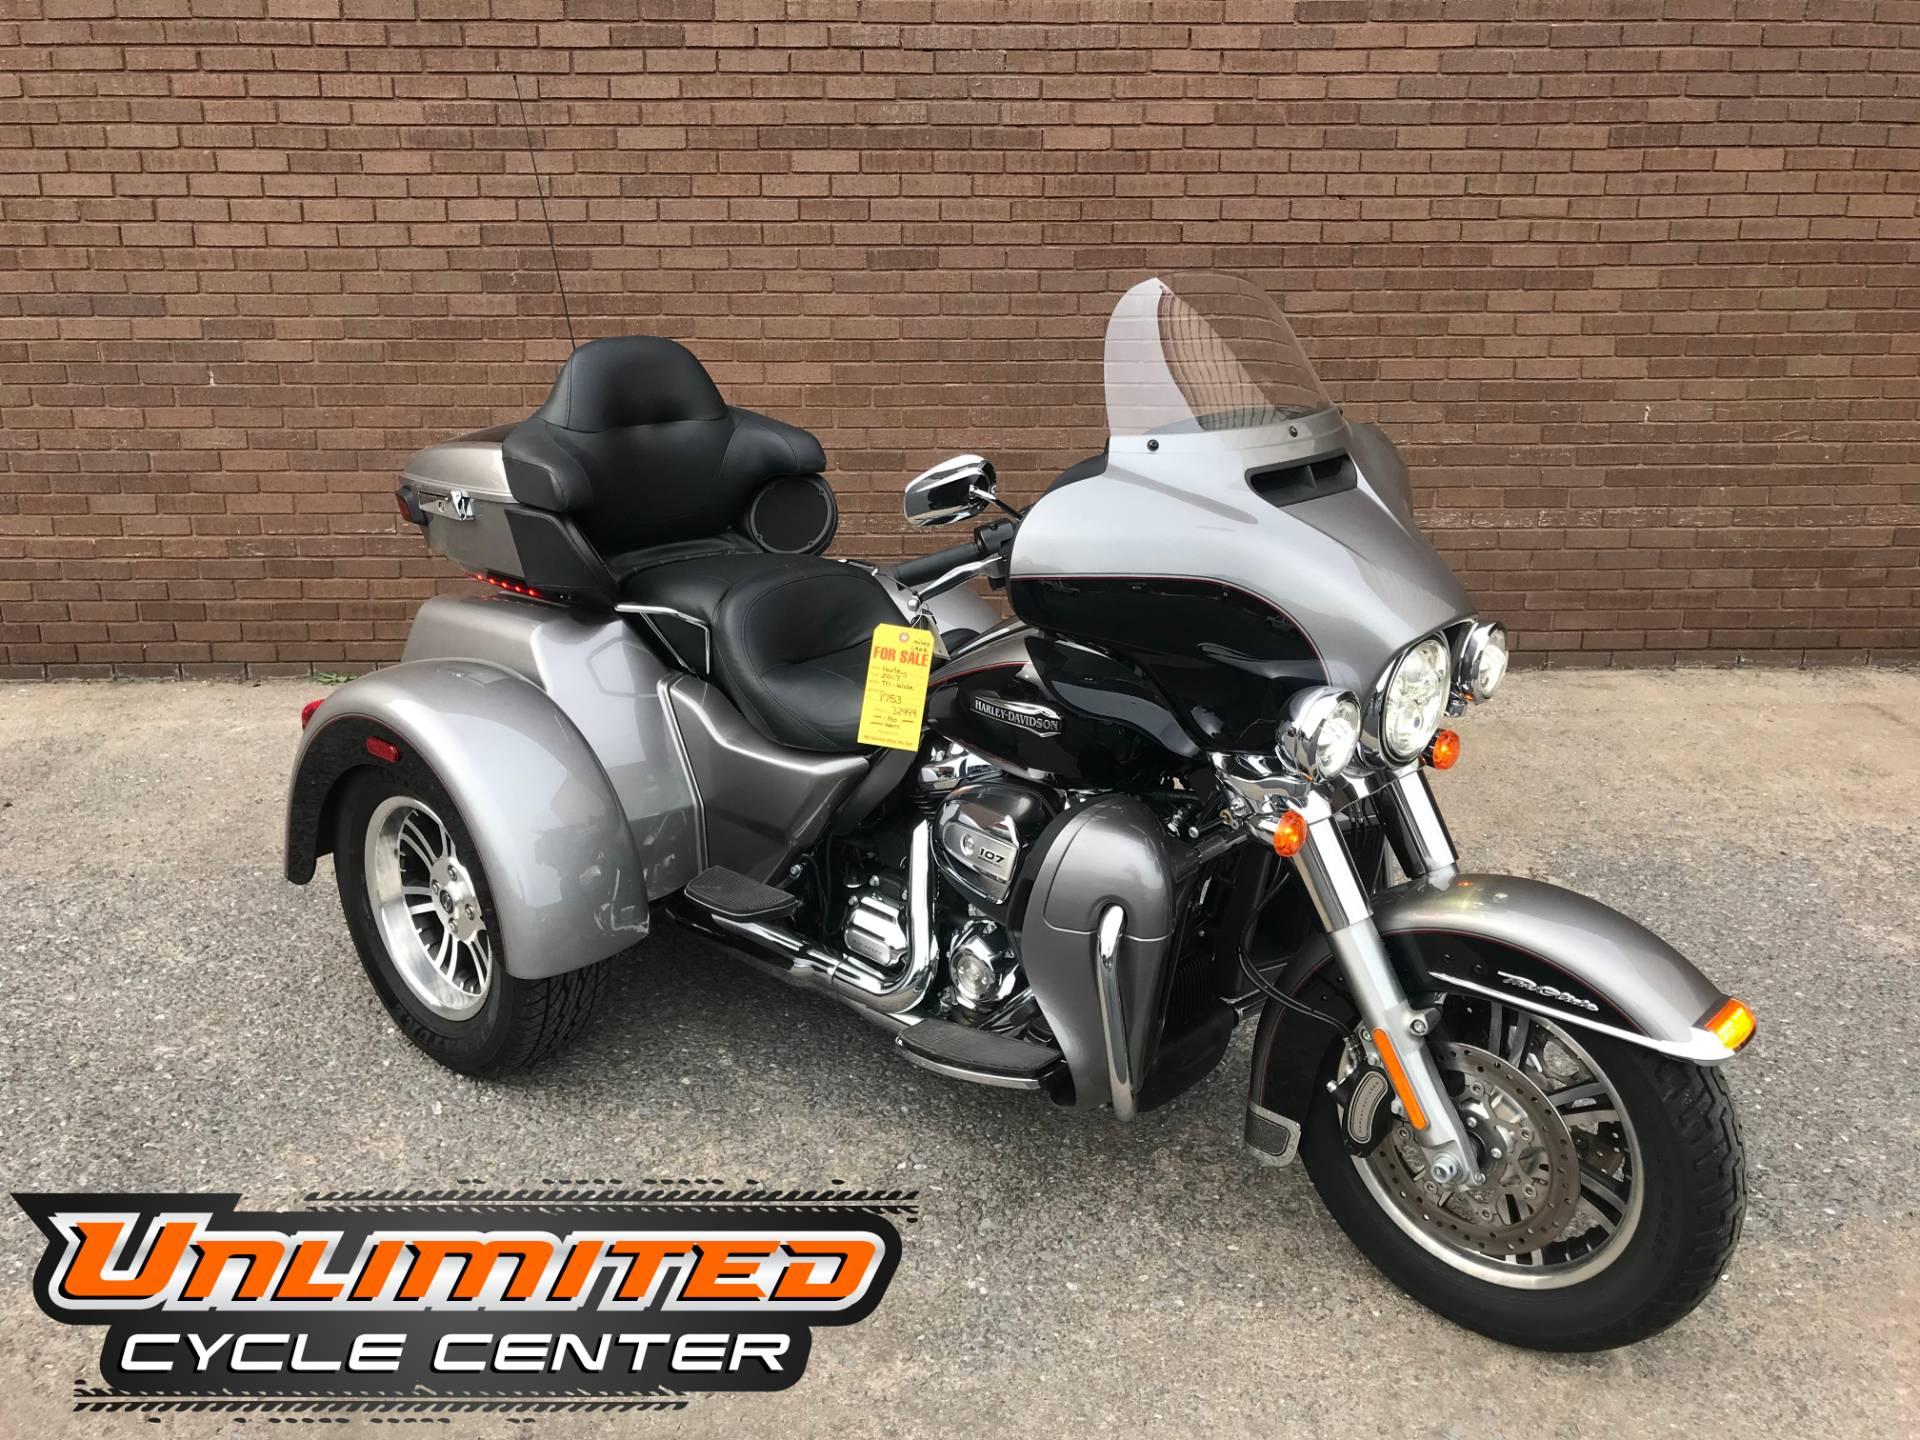 2016 Harley Davidson Tri Glide Ultra Gallery 670252: 2017 Harley-Davidson Tri Glide® Ultra Trikes Tyrone